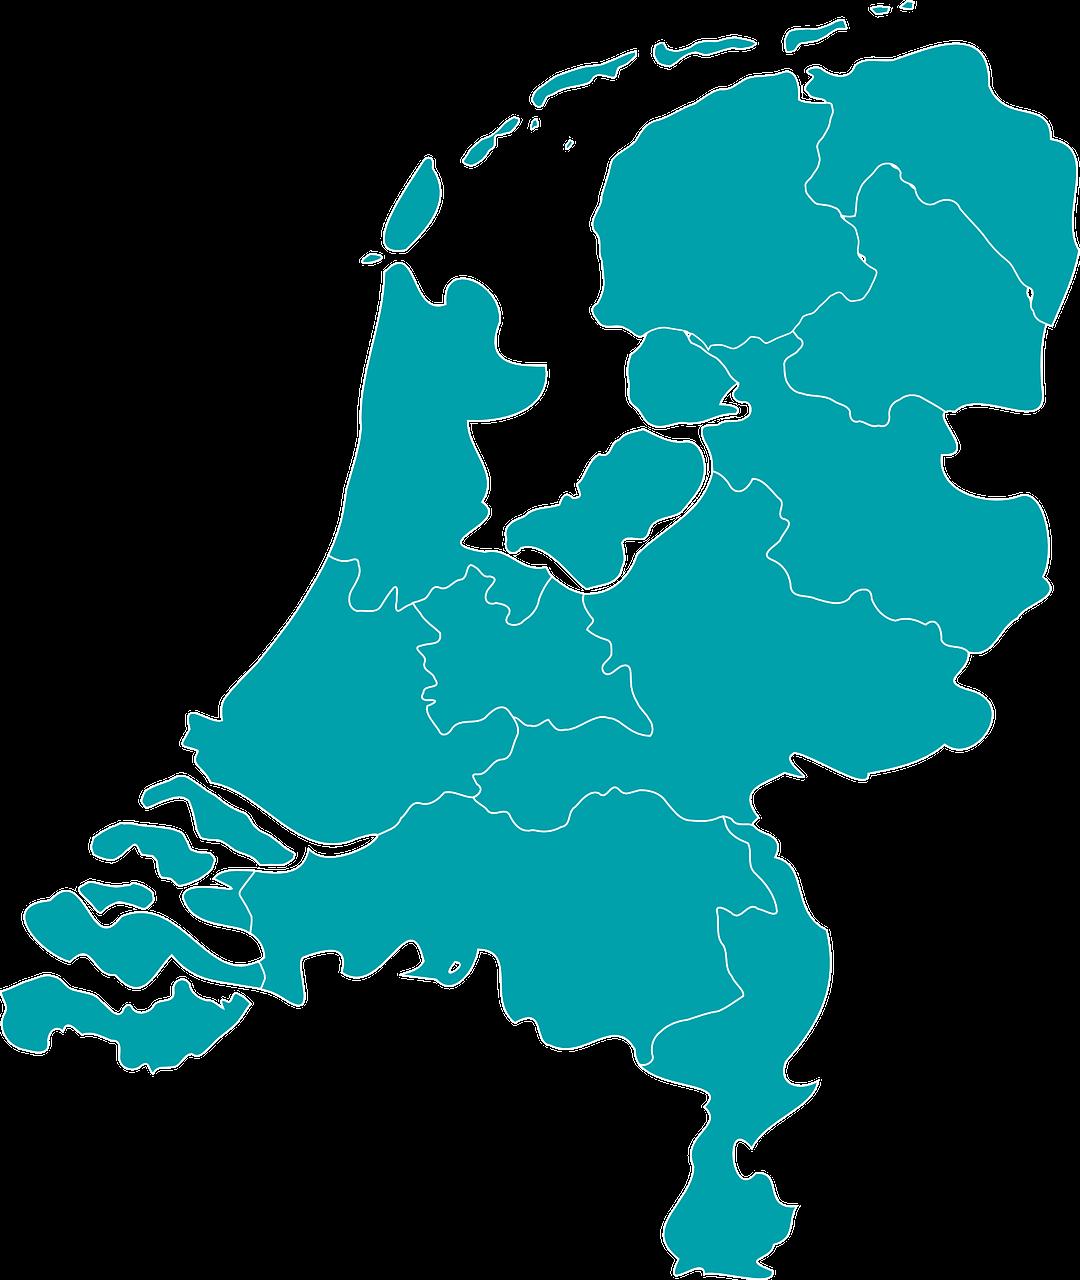 Voorstel regio-indeling na hereniging